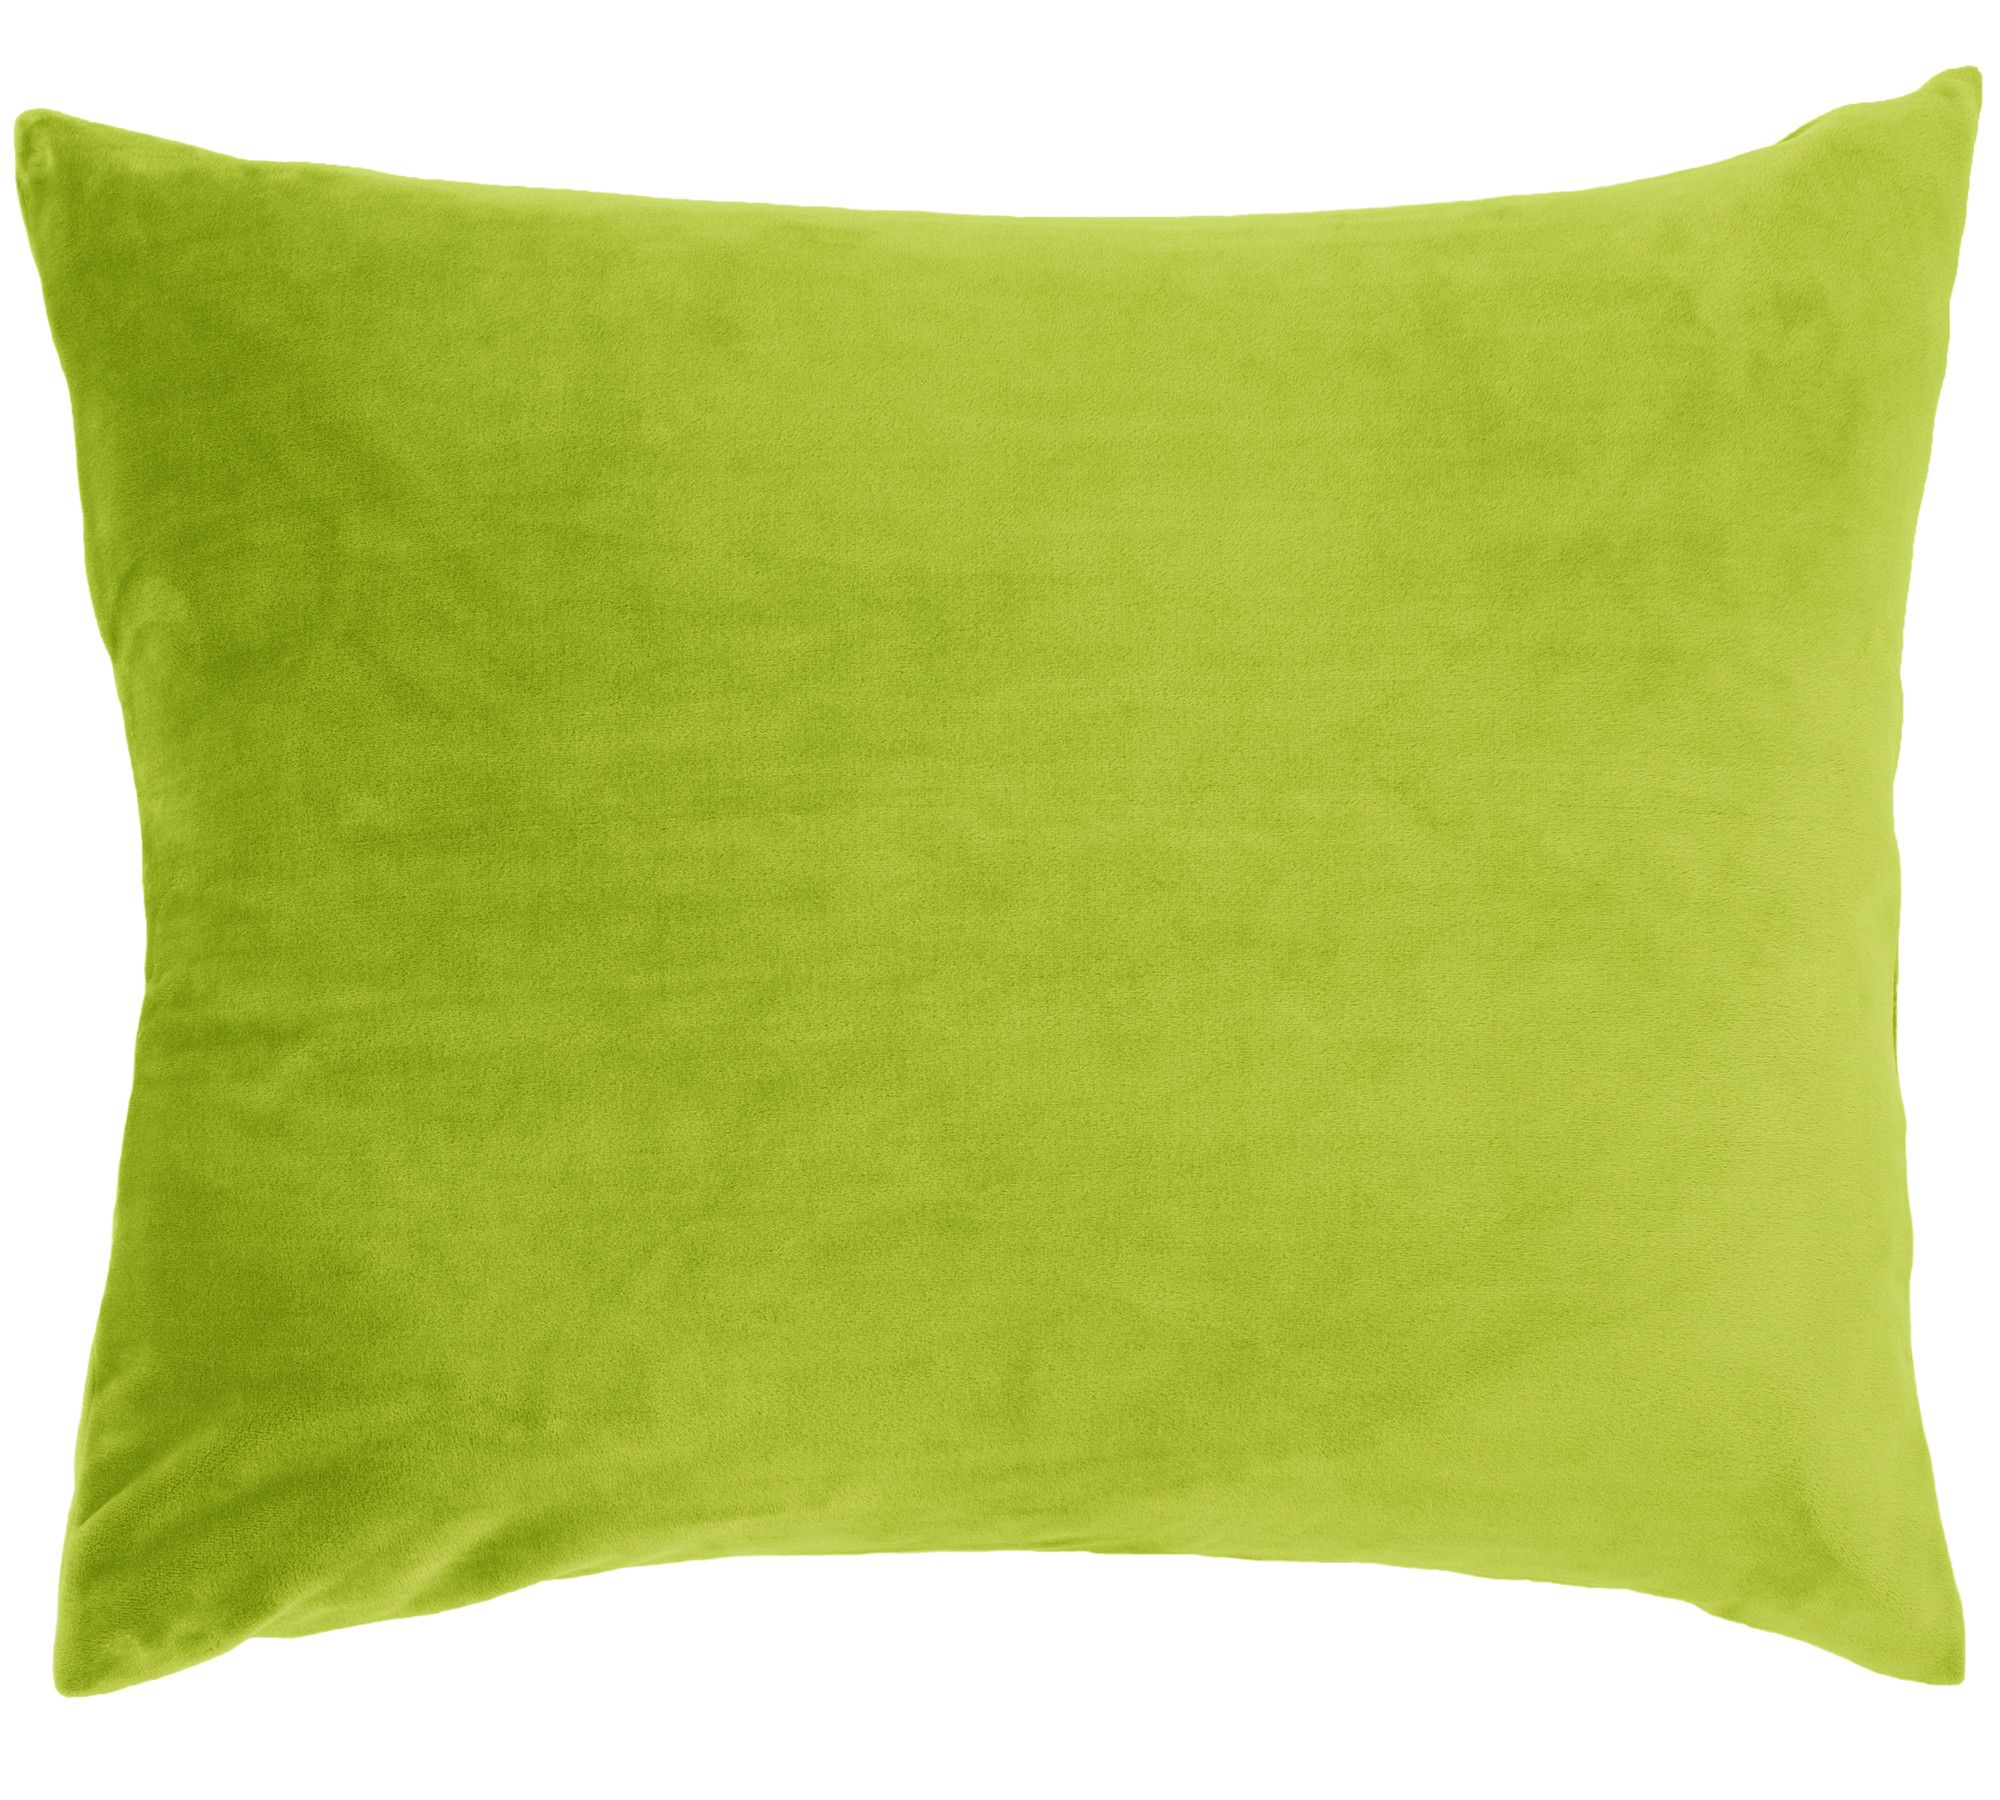 Dunst pillow products pinterest fleece throw throw pillows